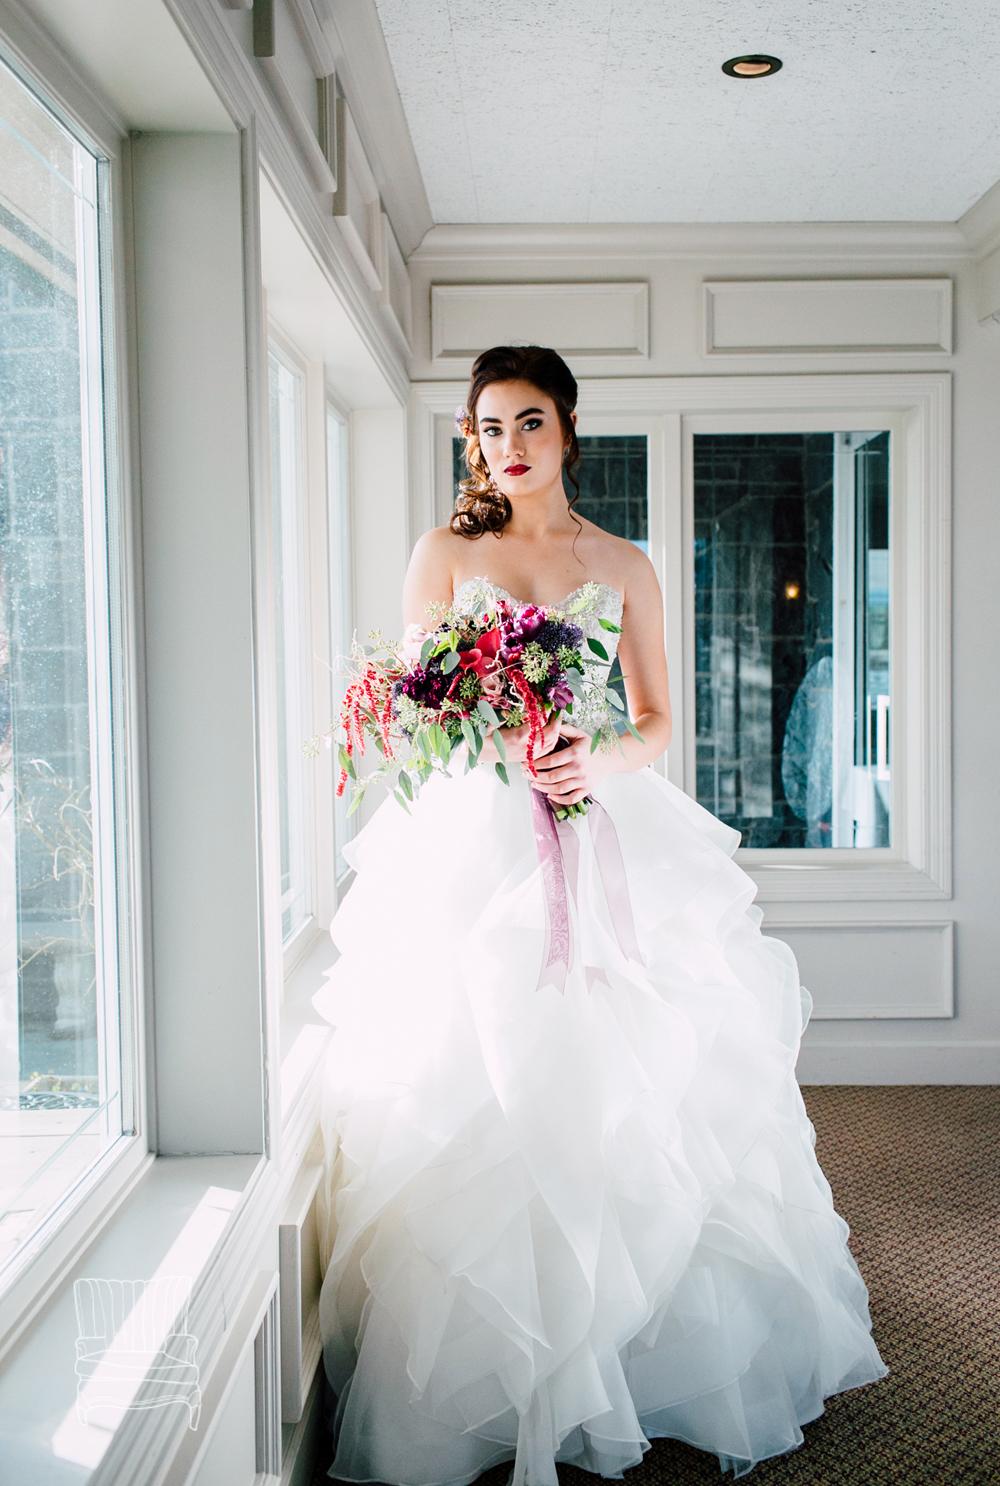 001-bellingham-wedding-photographer-katheryn-moran-bellwether-hotel-glitz-glam-styled-2016.jpg